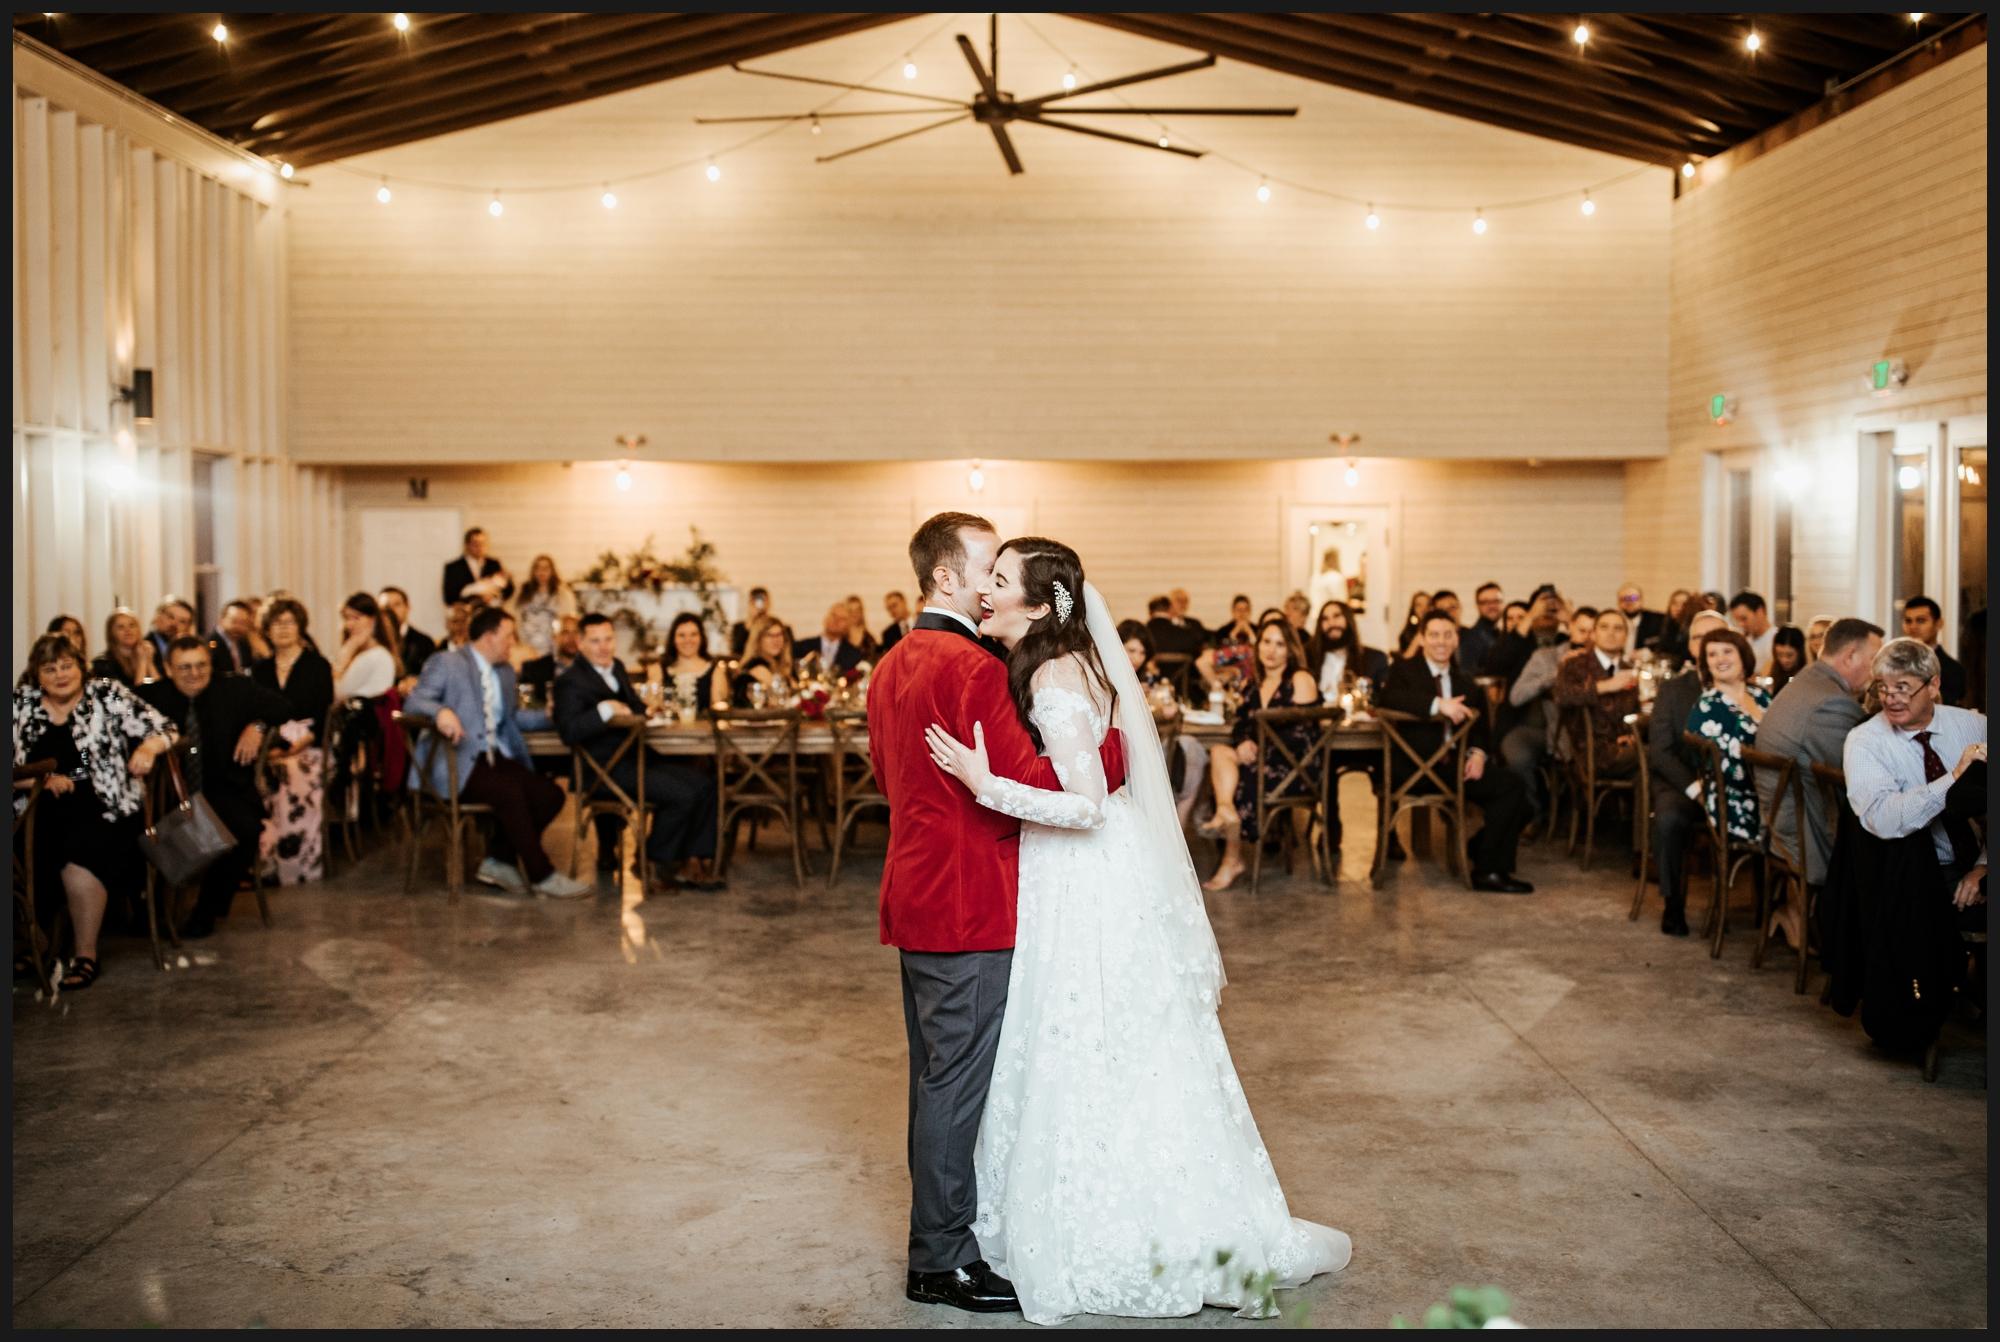 Orlando-Wedding-Photographer-destination-wedding-photographer-florida-wedding-photographer-hawaii-wedding-photographer_0534.jpg